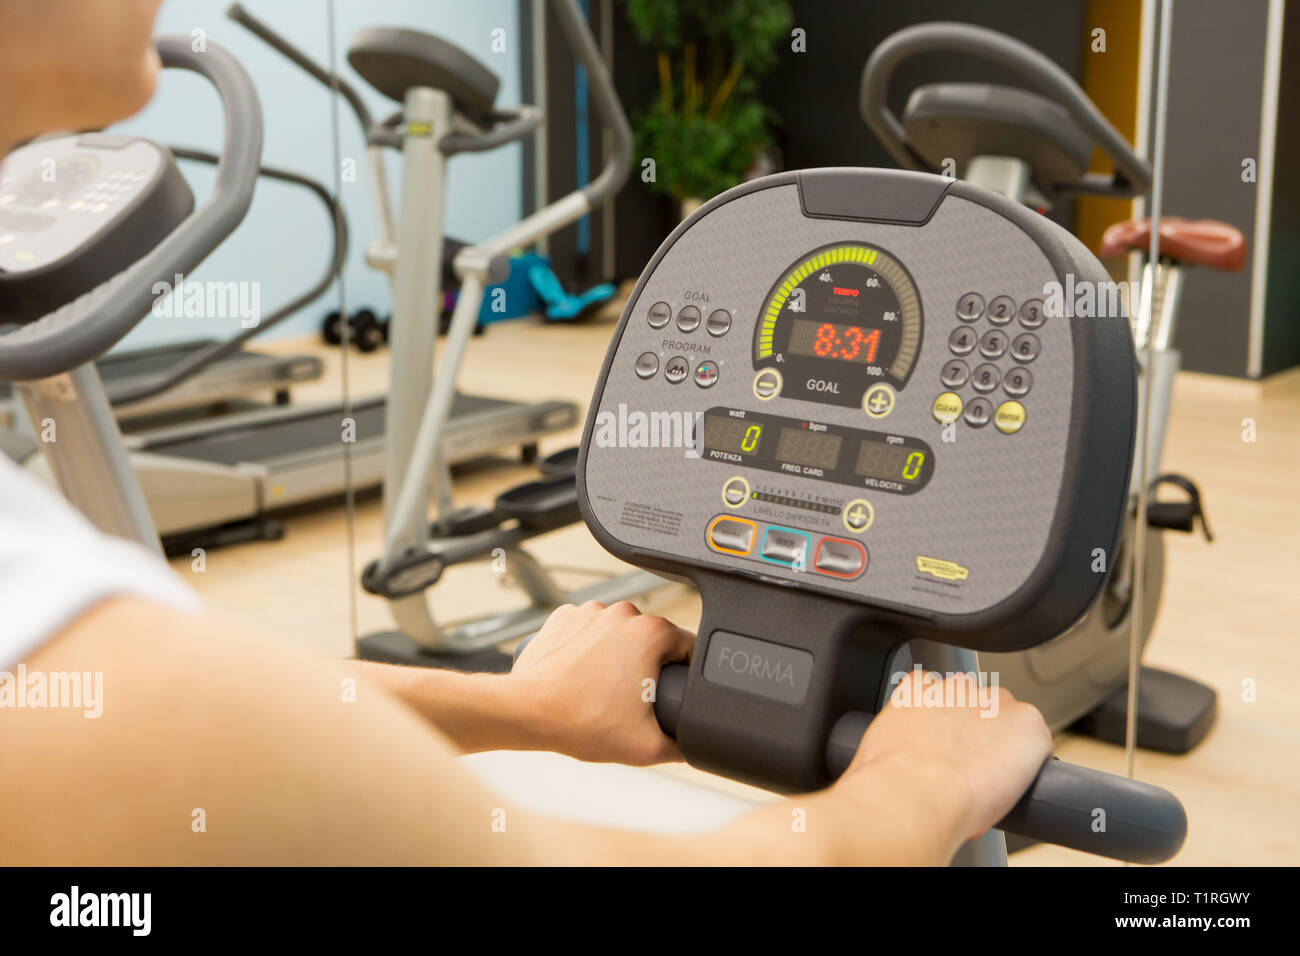 Fitness center - Stock Image